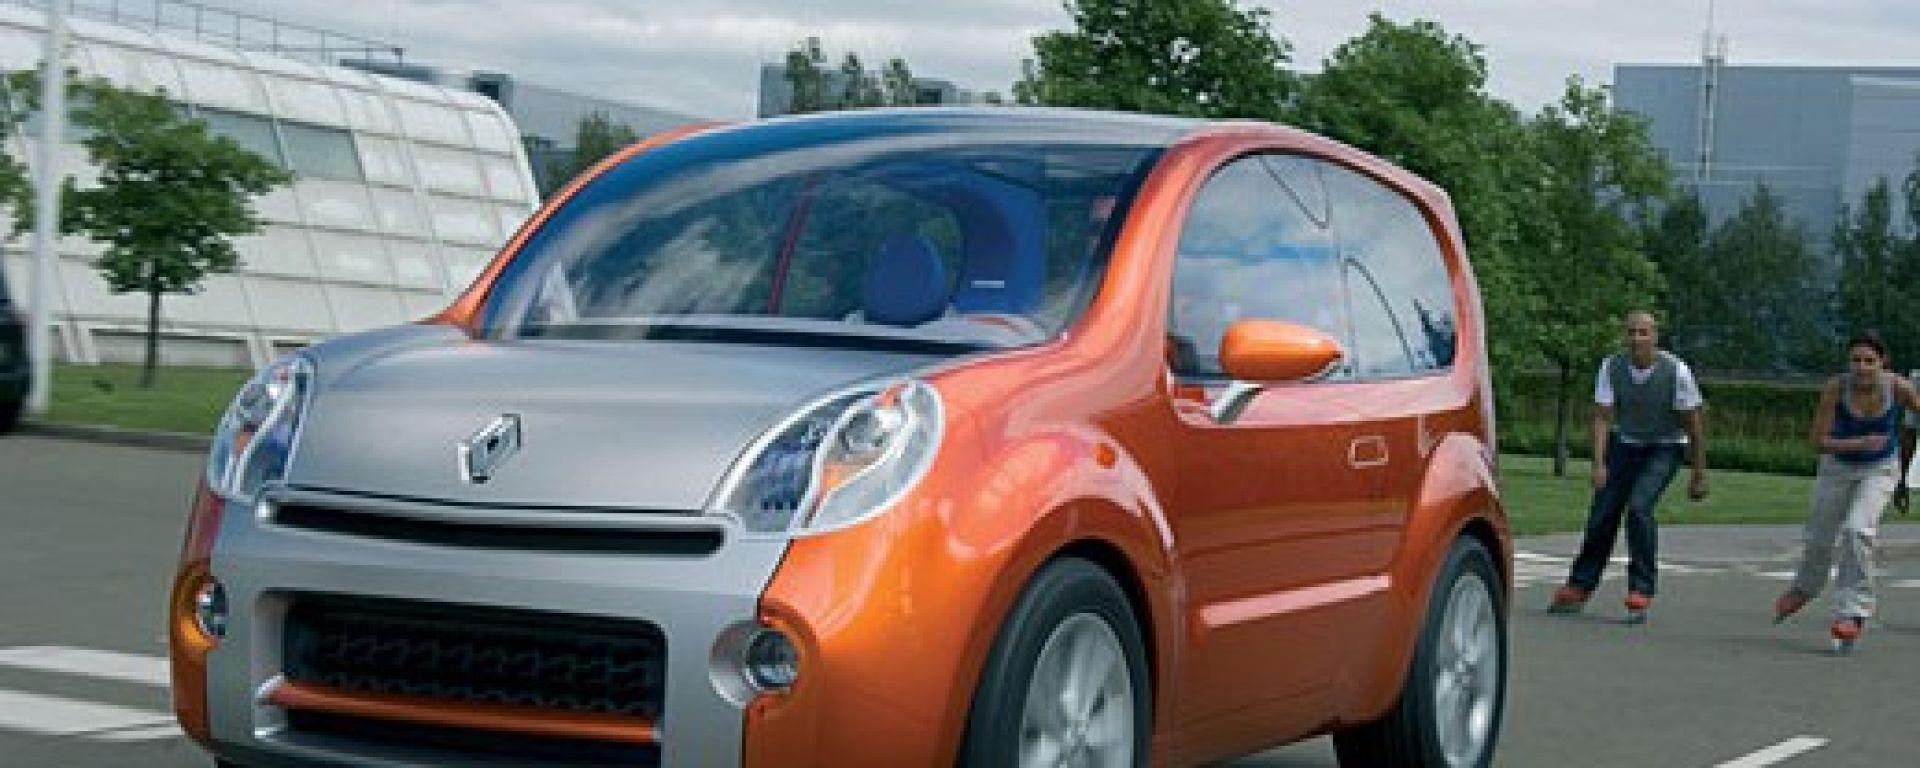 Renault Kangoo Compact Concept (gallery)